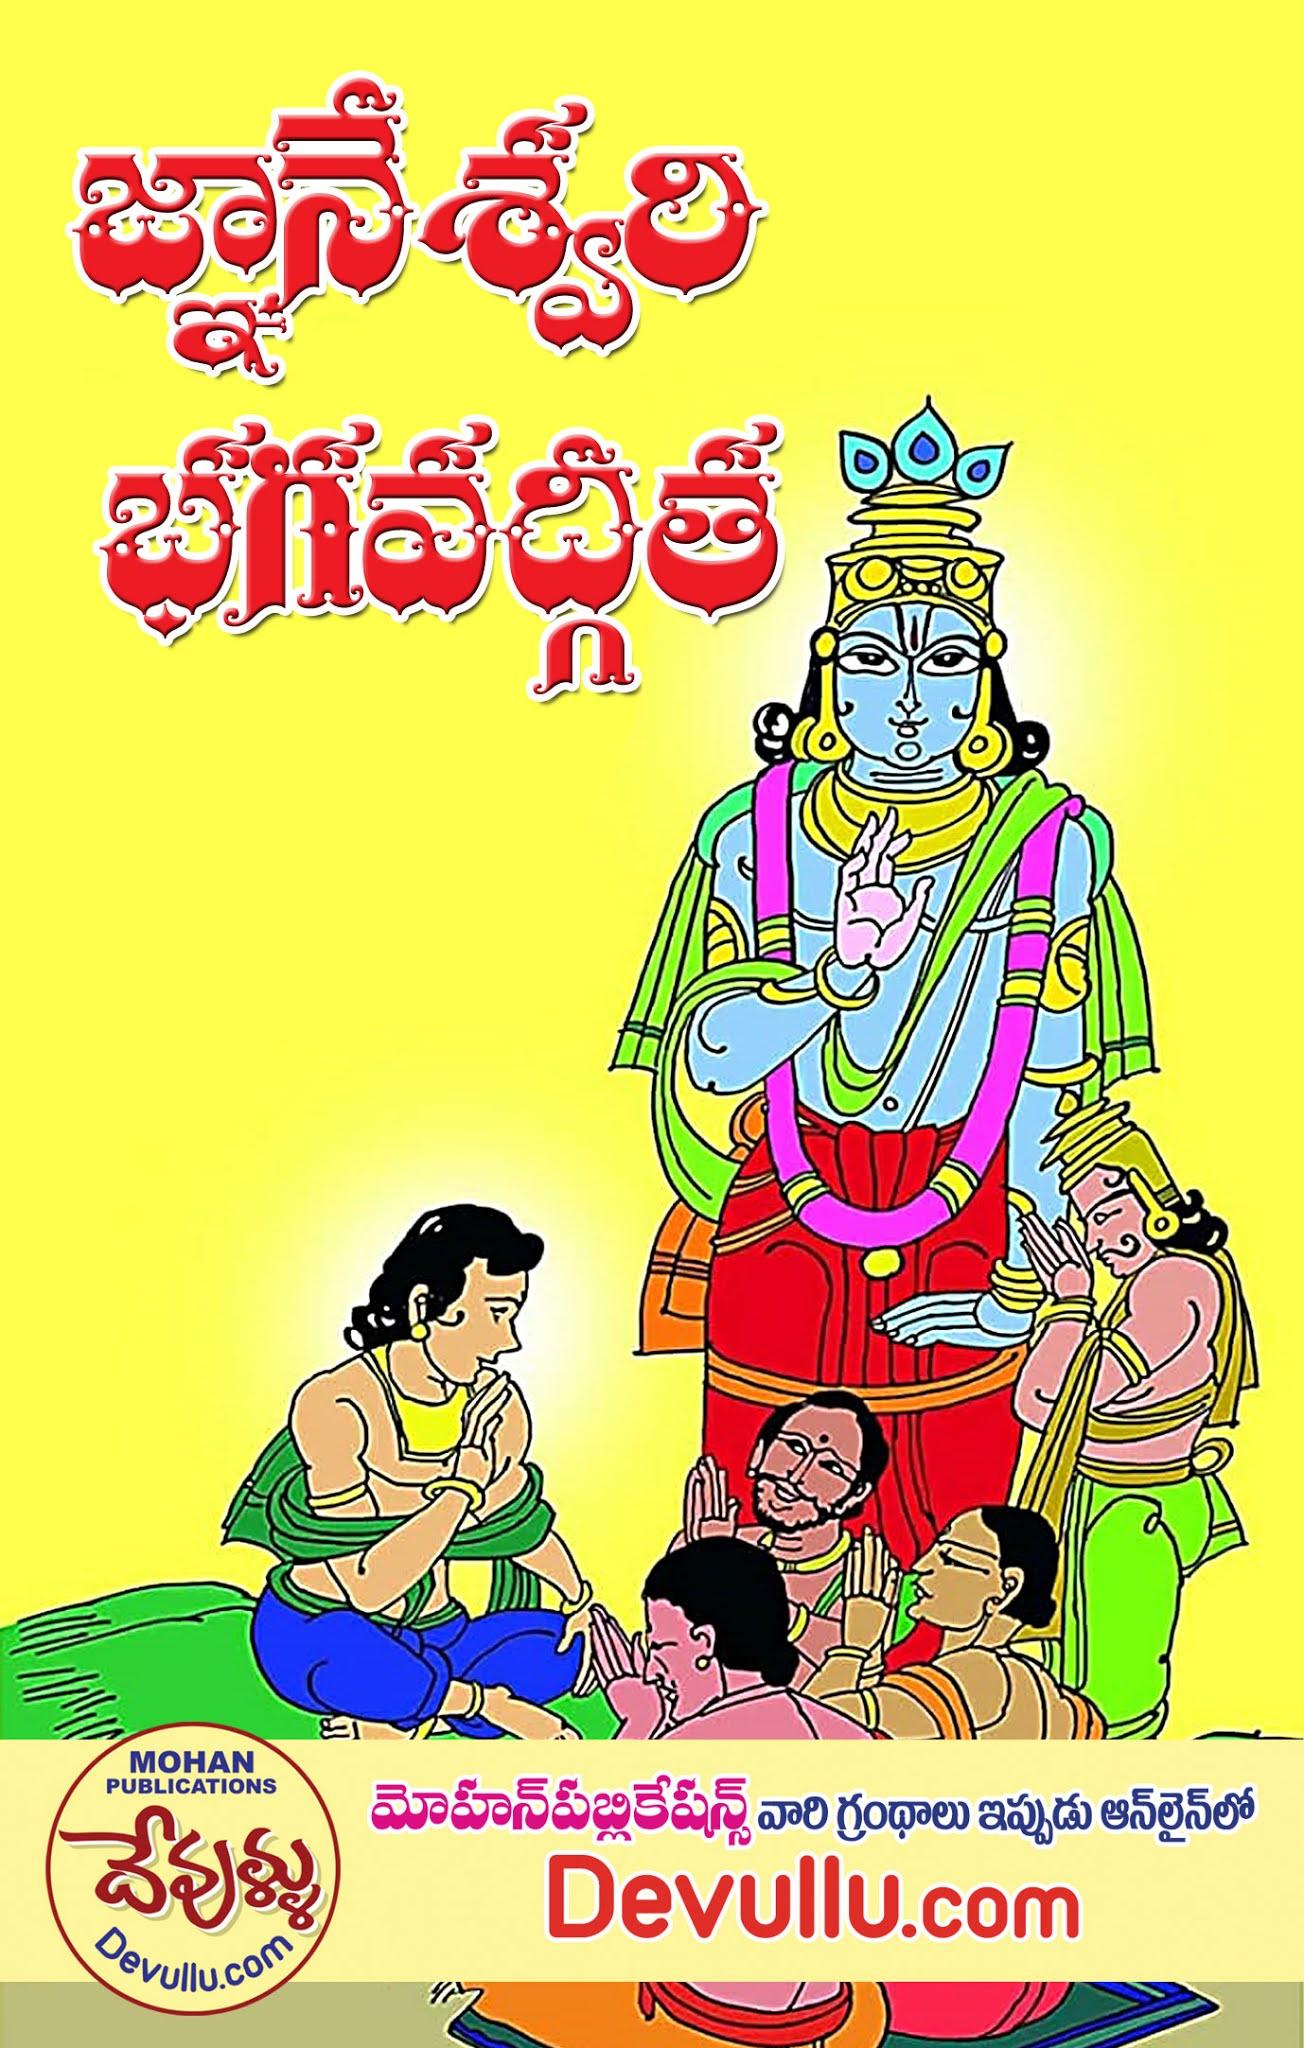 Gnaneswari Bhagavad Gita | జ్ఞానేశ్వరి భగవద్గీత | telugu books